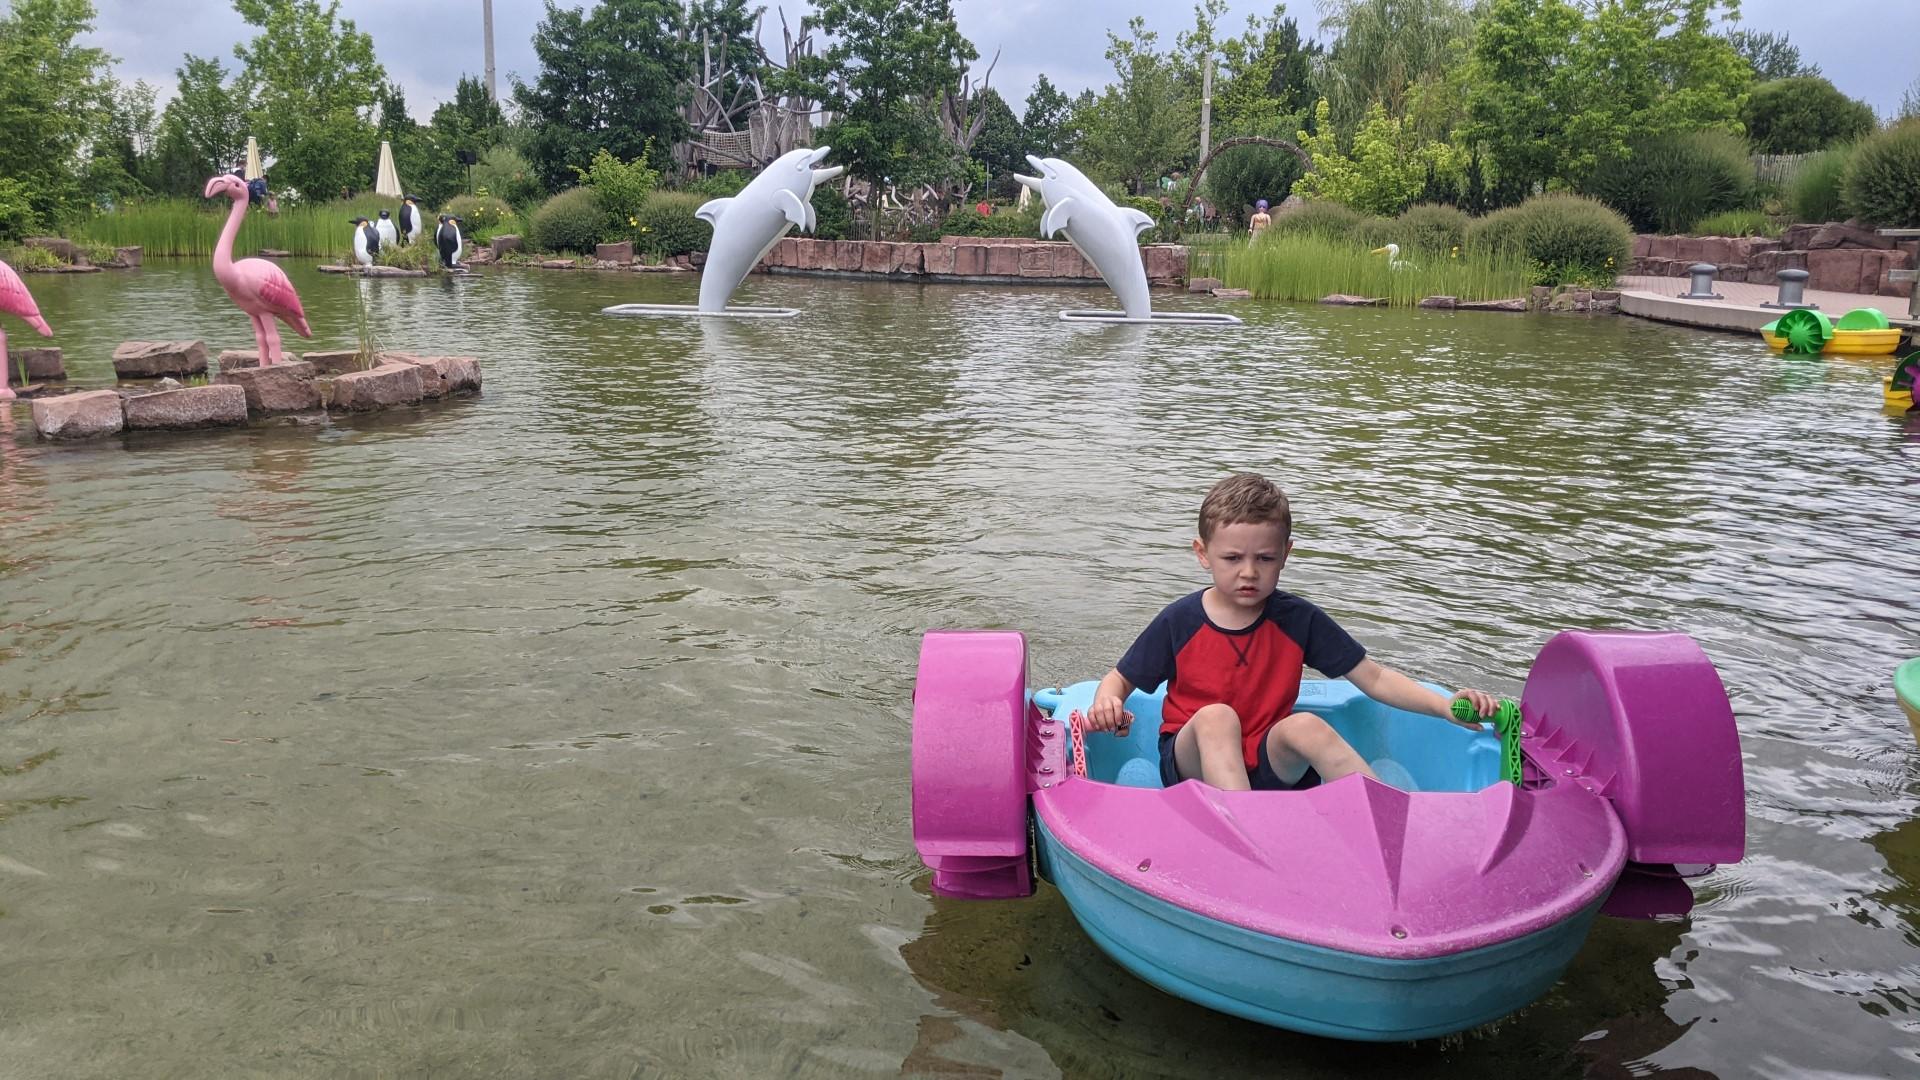 playmobil park in germany